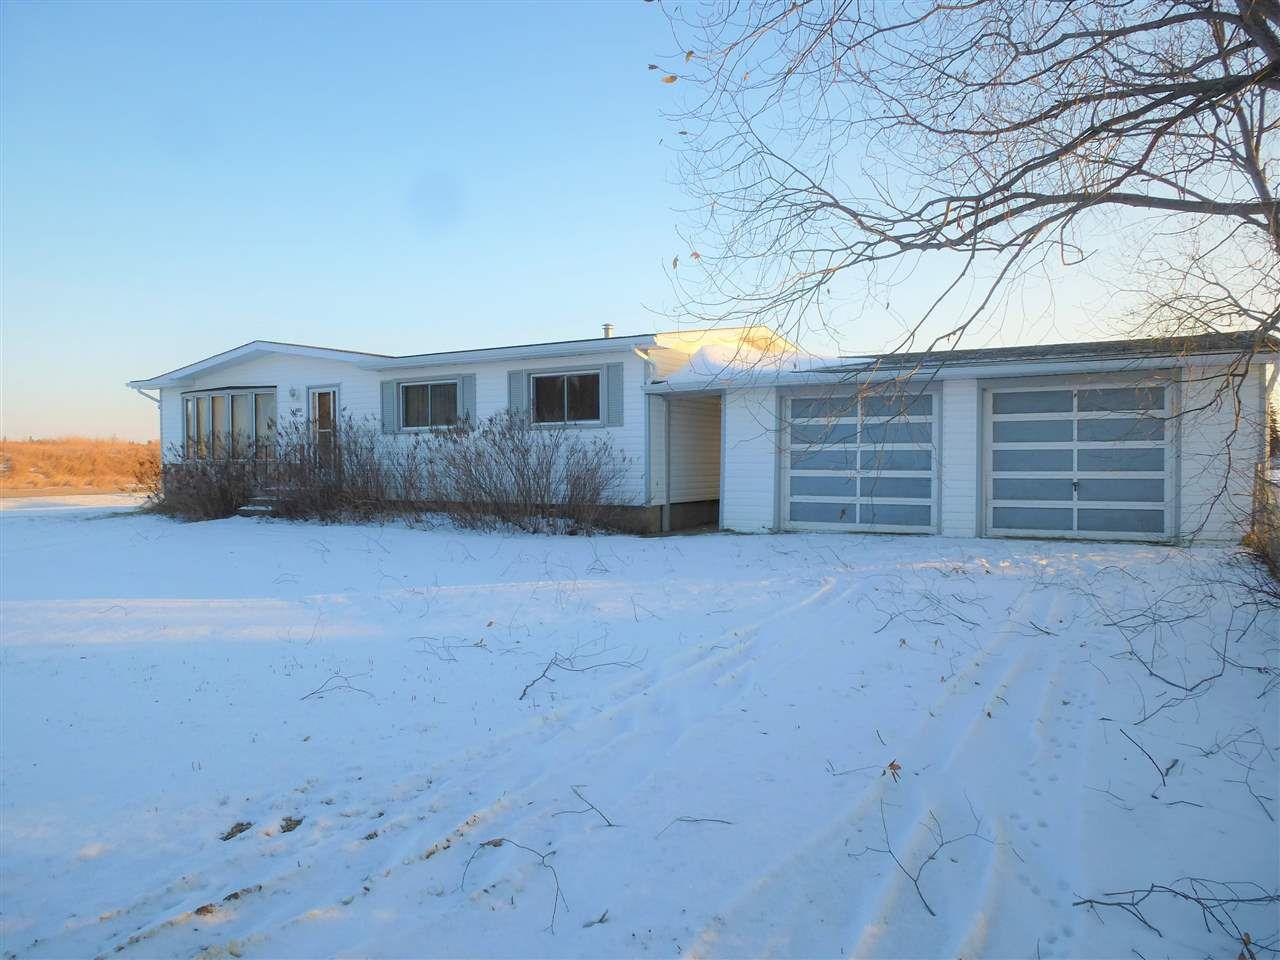 Main Photo: 4801 53 Avenue: Millet House for sale : MLS®# E4135619